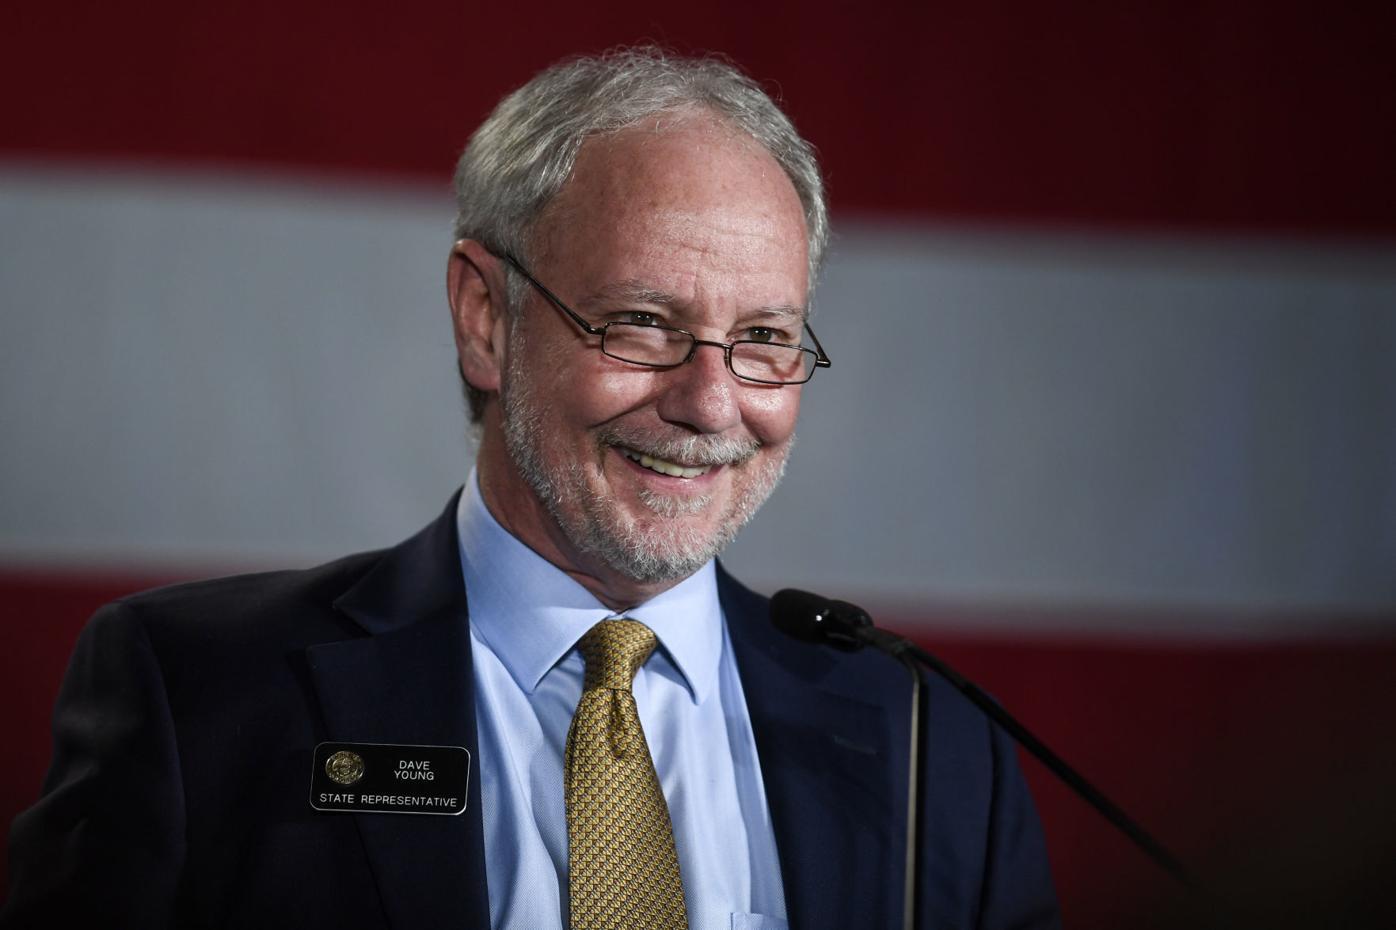 Colorado Treasurer Dave Young